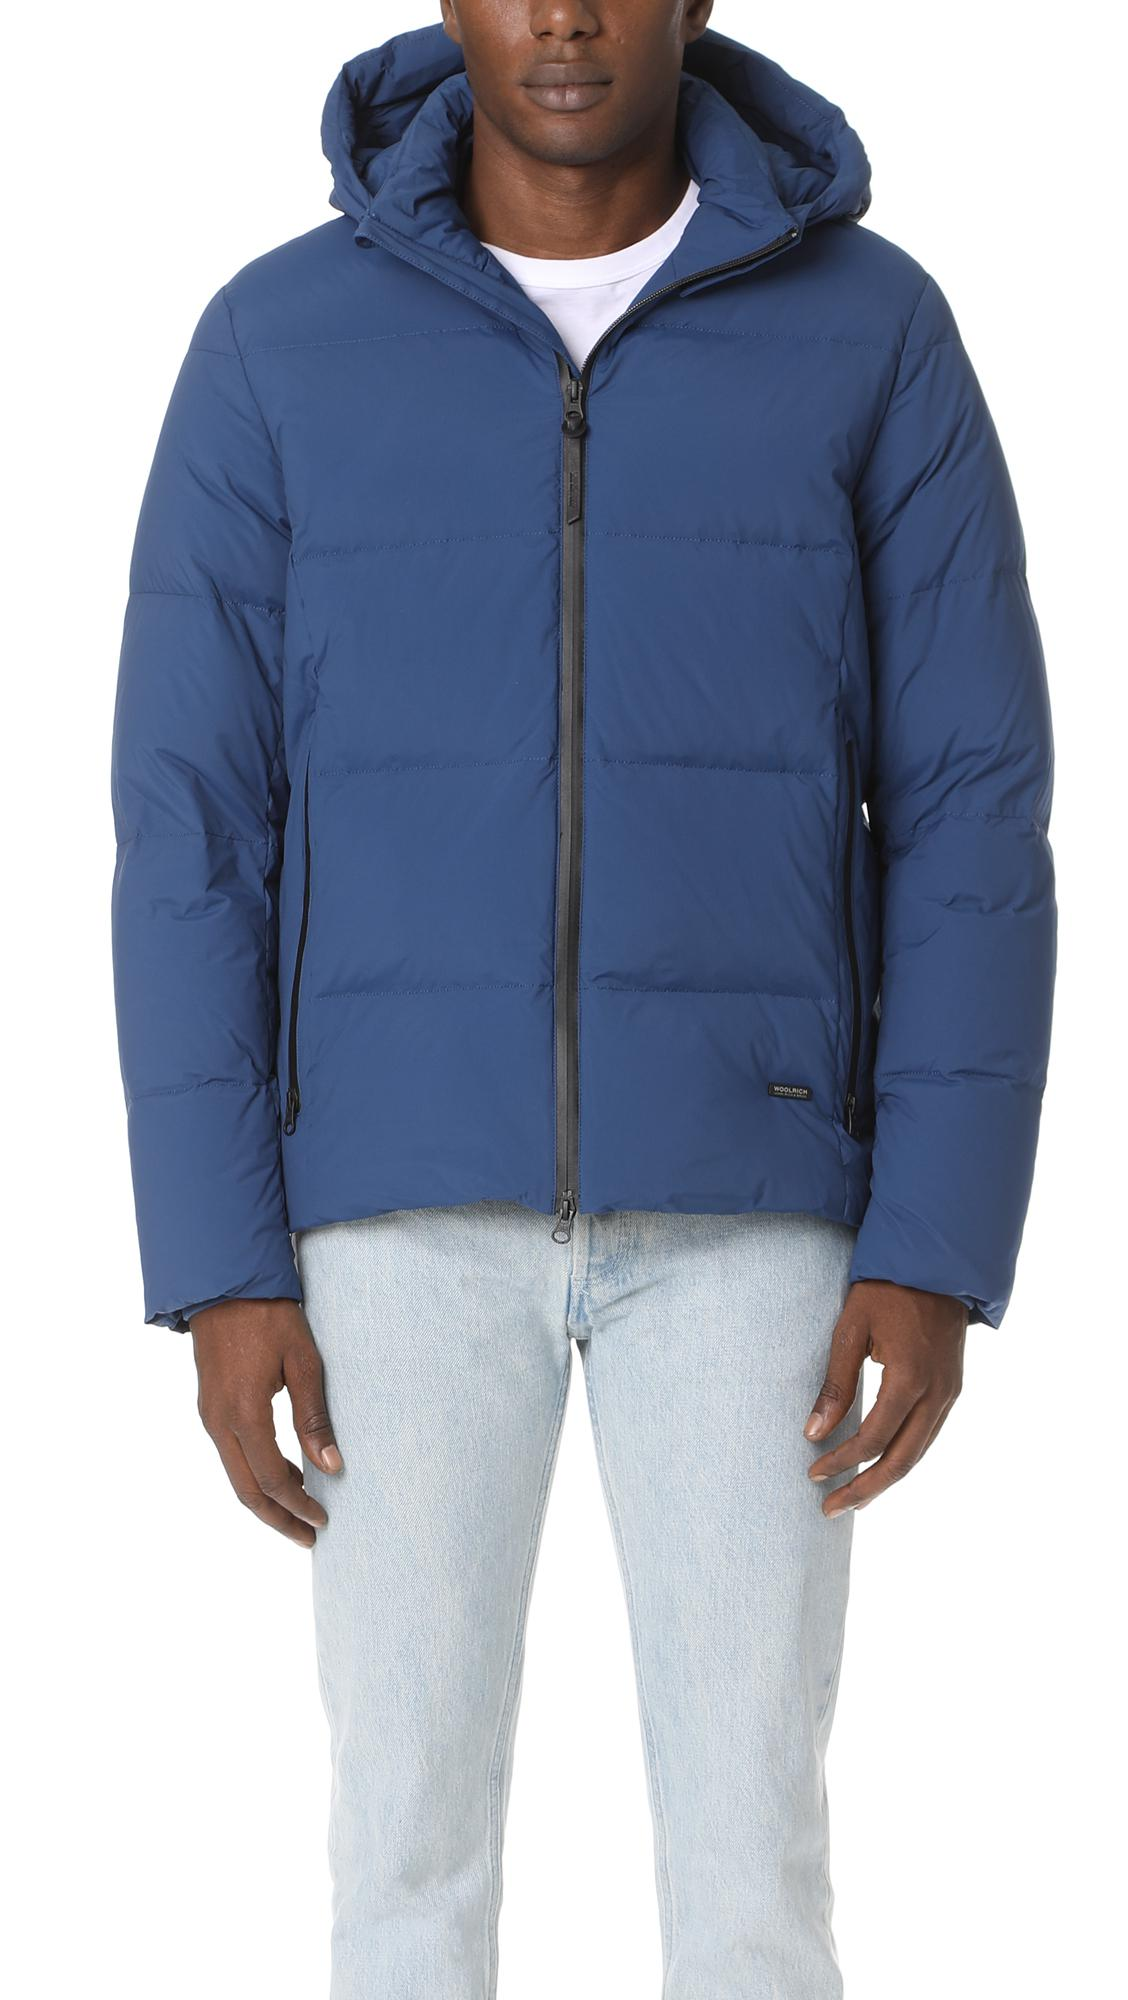 Lyst Jacket In Comfort For Woolrich Blue Men wfnBxwzZ